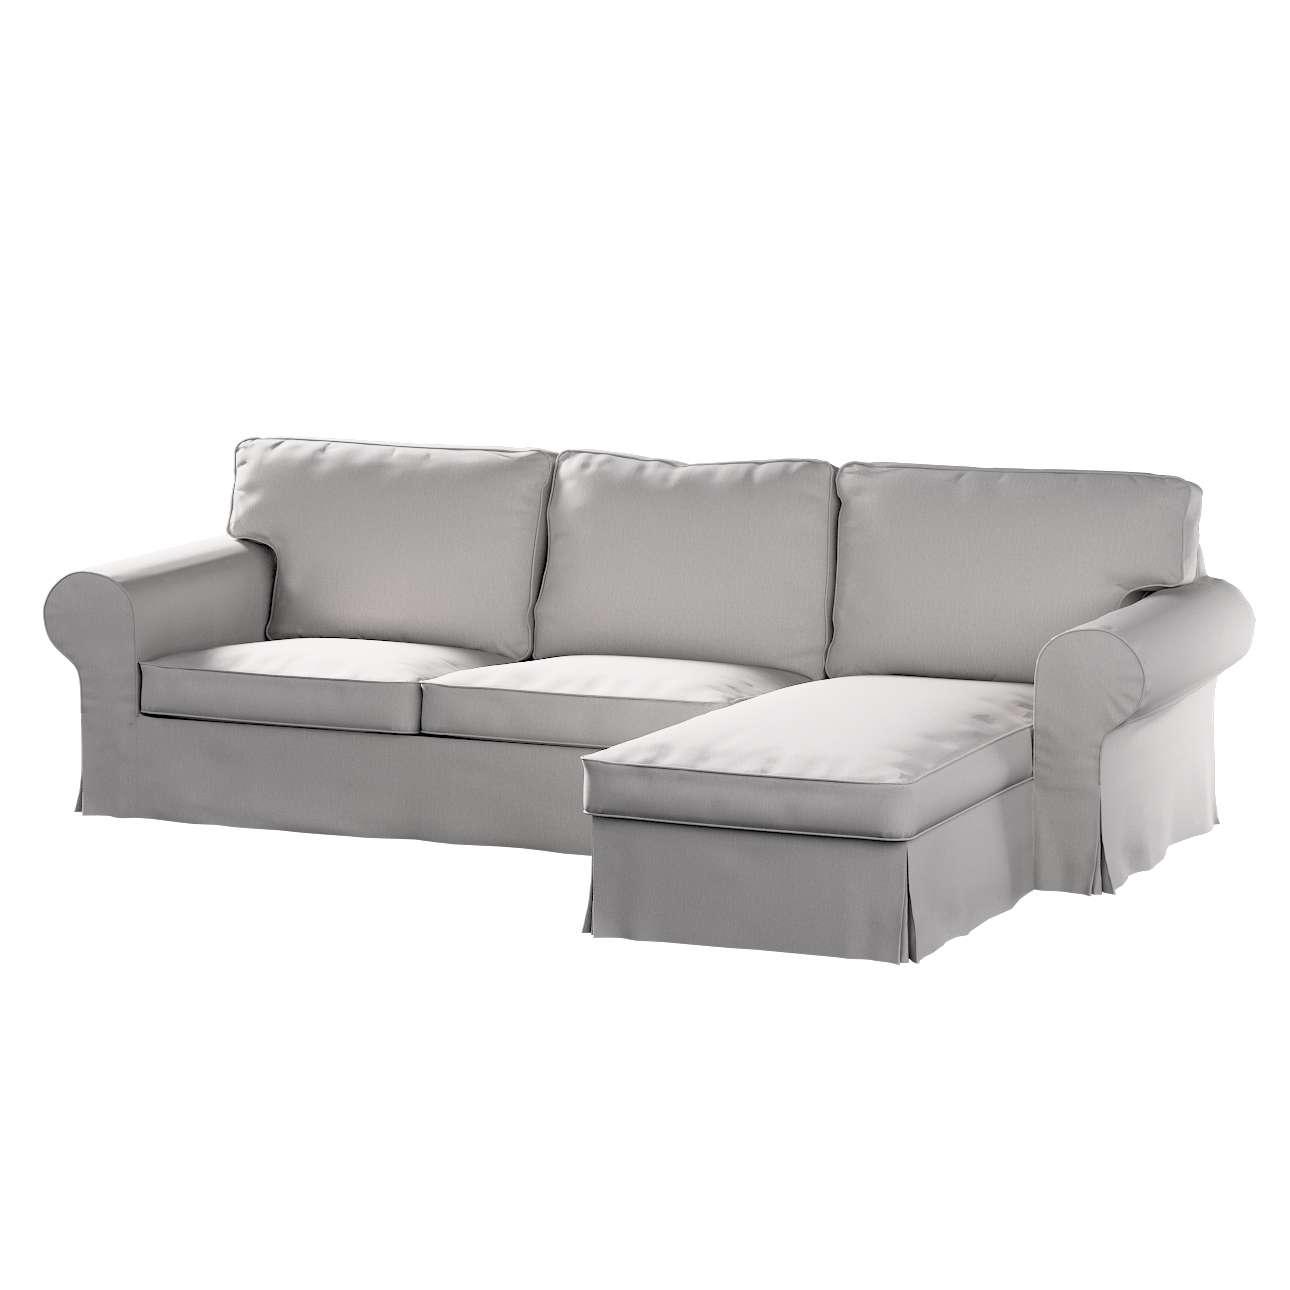 Ektorp 2-Sitzer Sofabezug mit Recamiere Ektorp 2-Sitzer Sofabezug mit Recamiere von der Kollektion Chenille , Stoff: 702-23